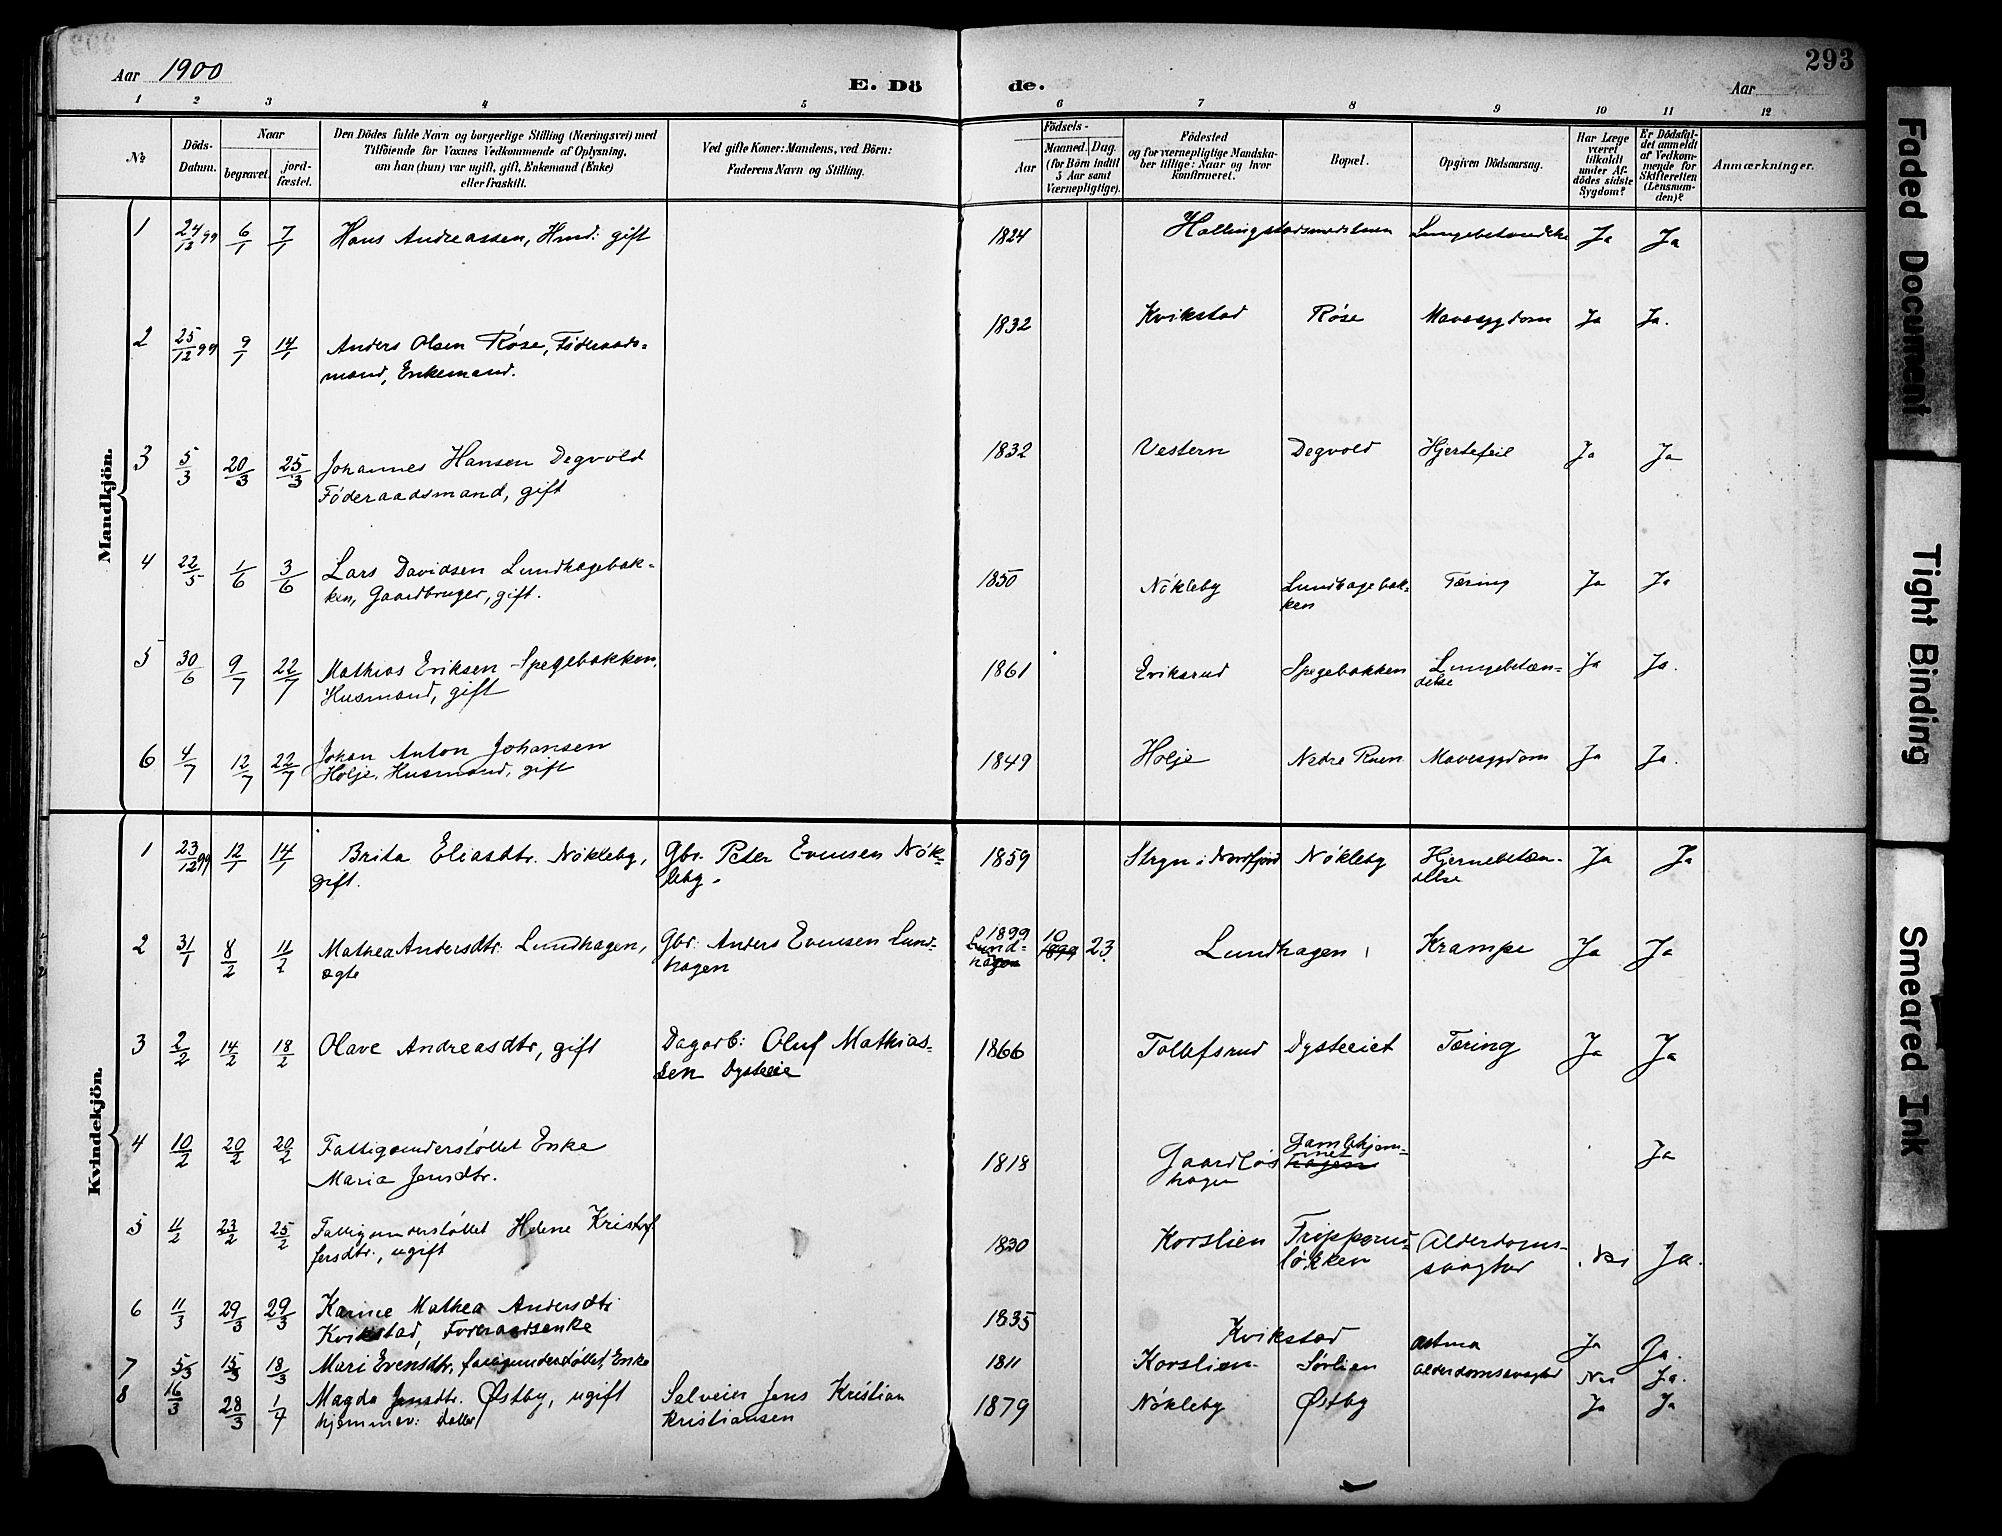 SAH, Vestre Toten prestekontor, H/Ha/Haa/L0013: Ministerialbok nr. 13, 1895-1911, s. 293